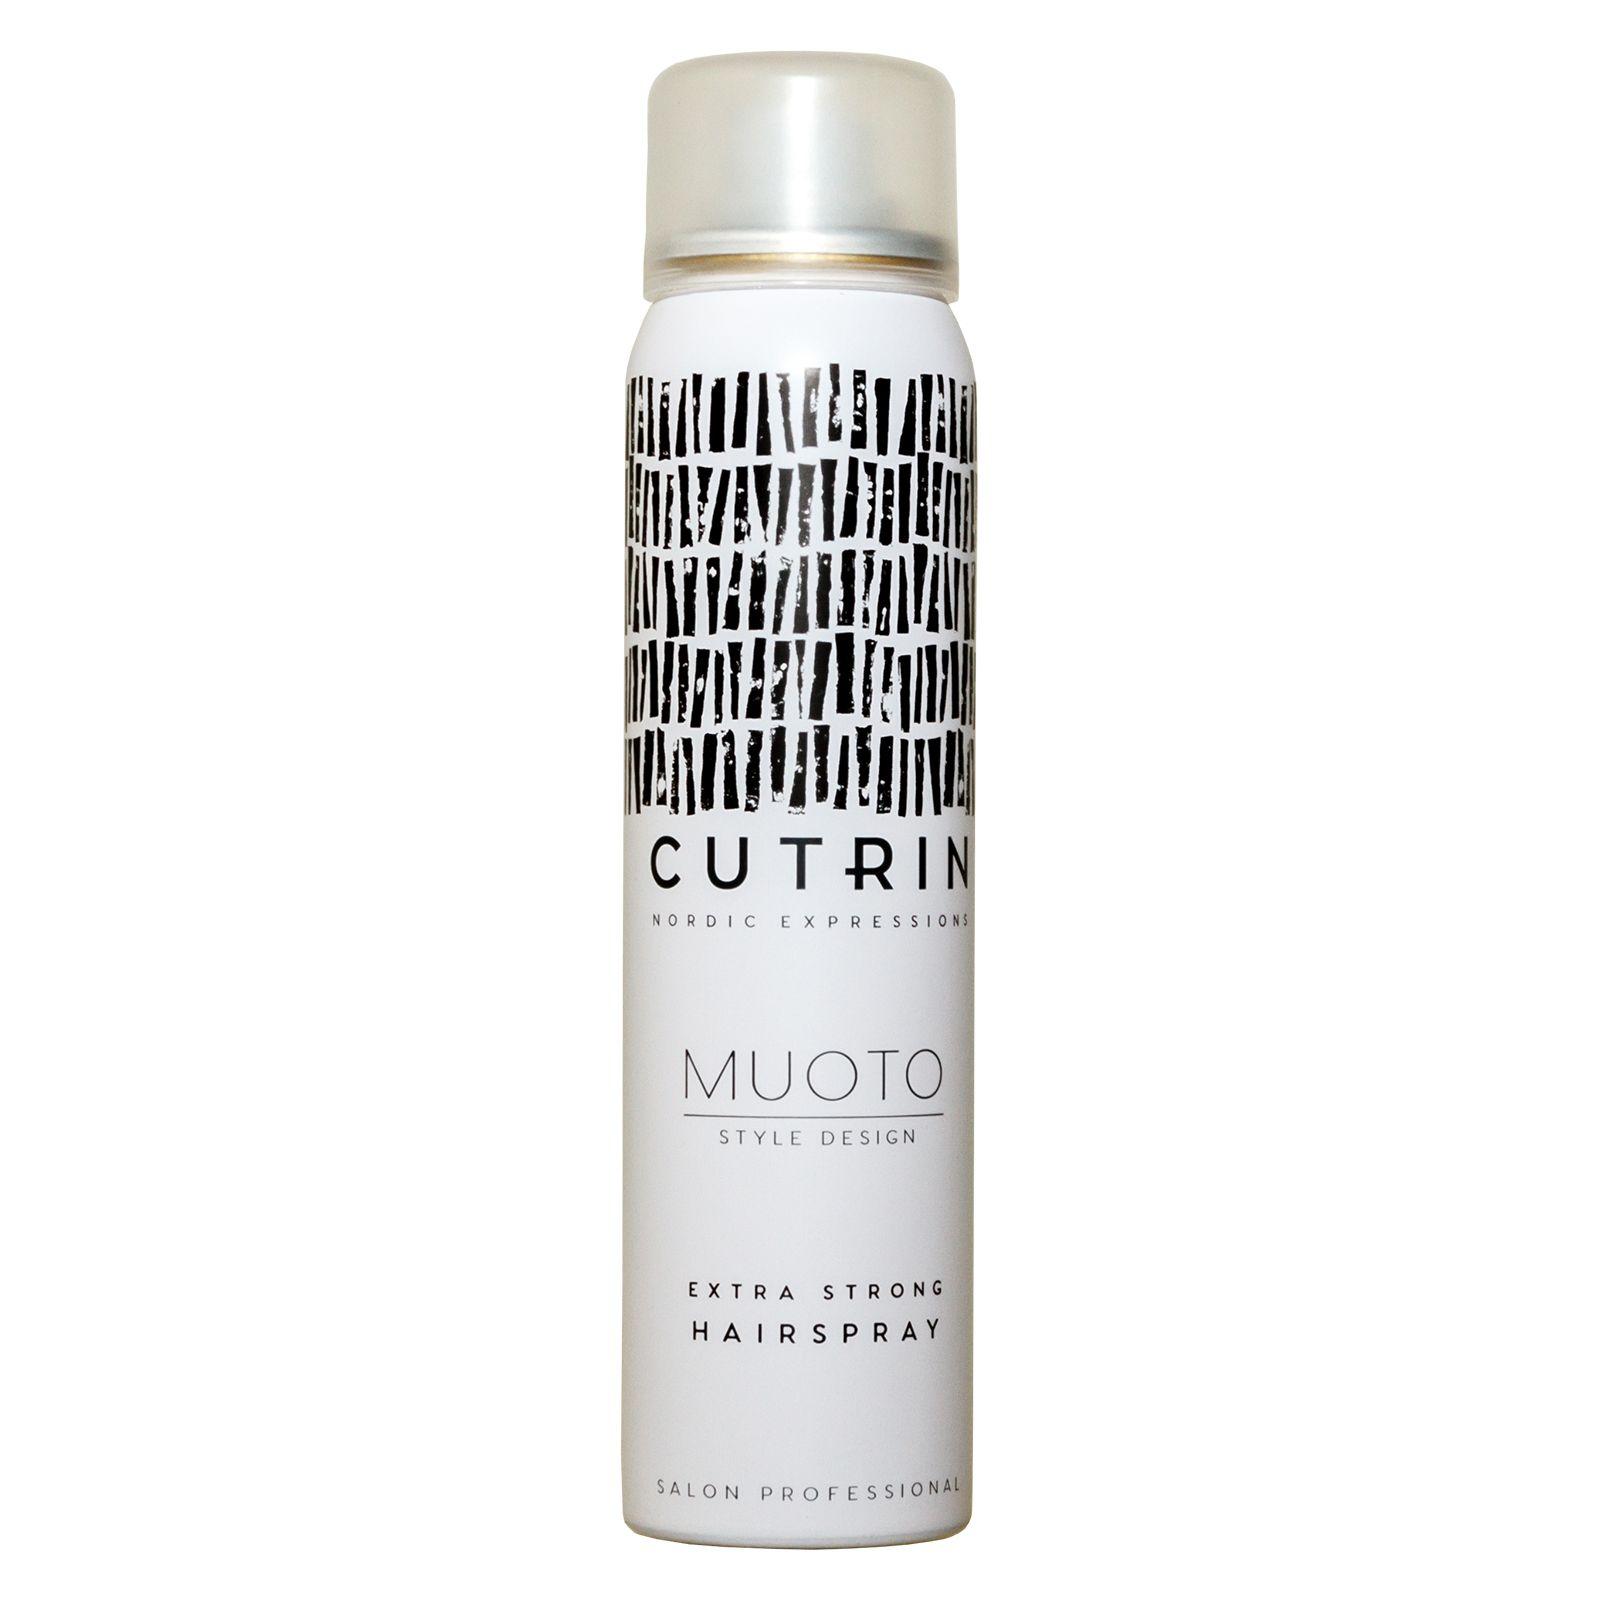 Cutrin Muoto Extra Strong Hairspray - Лак экстрасильной фиксации 100 мл